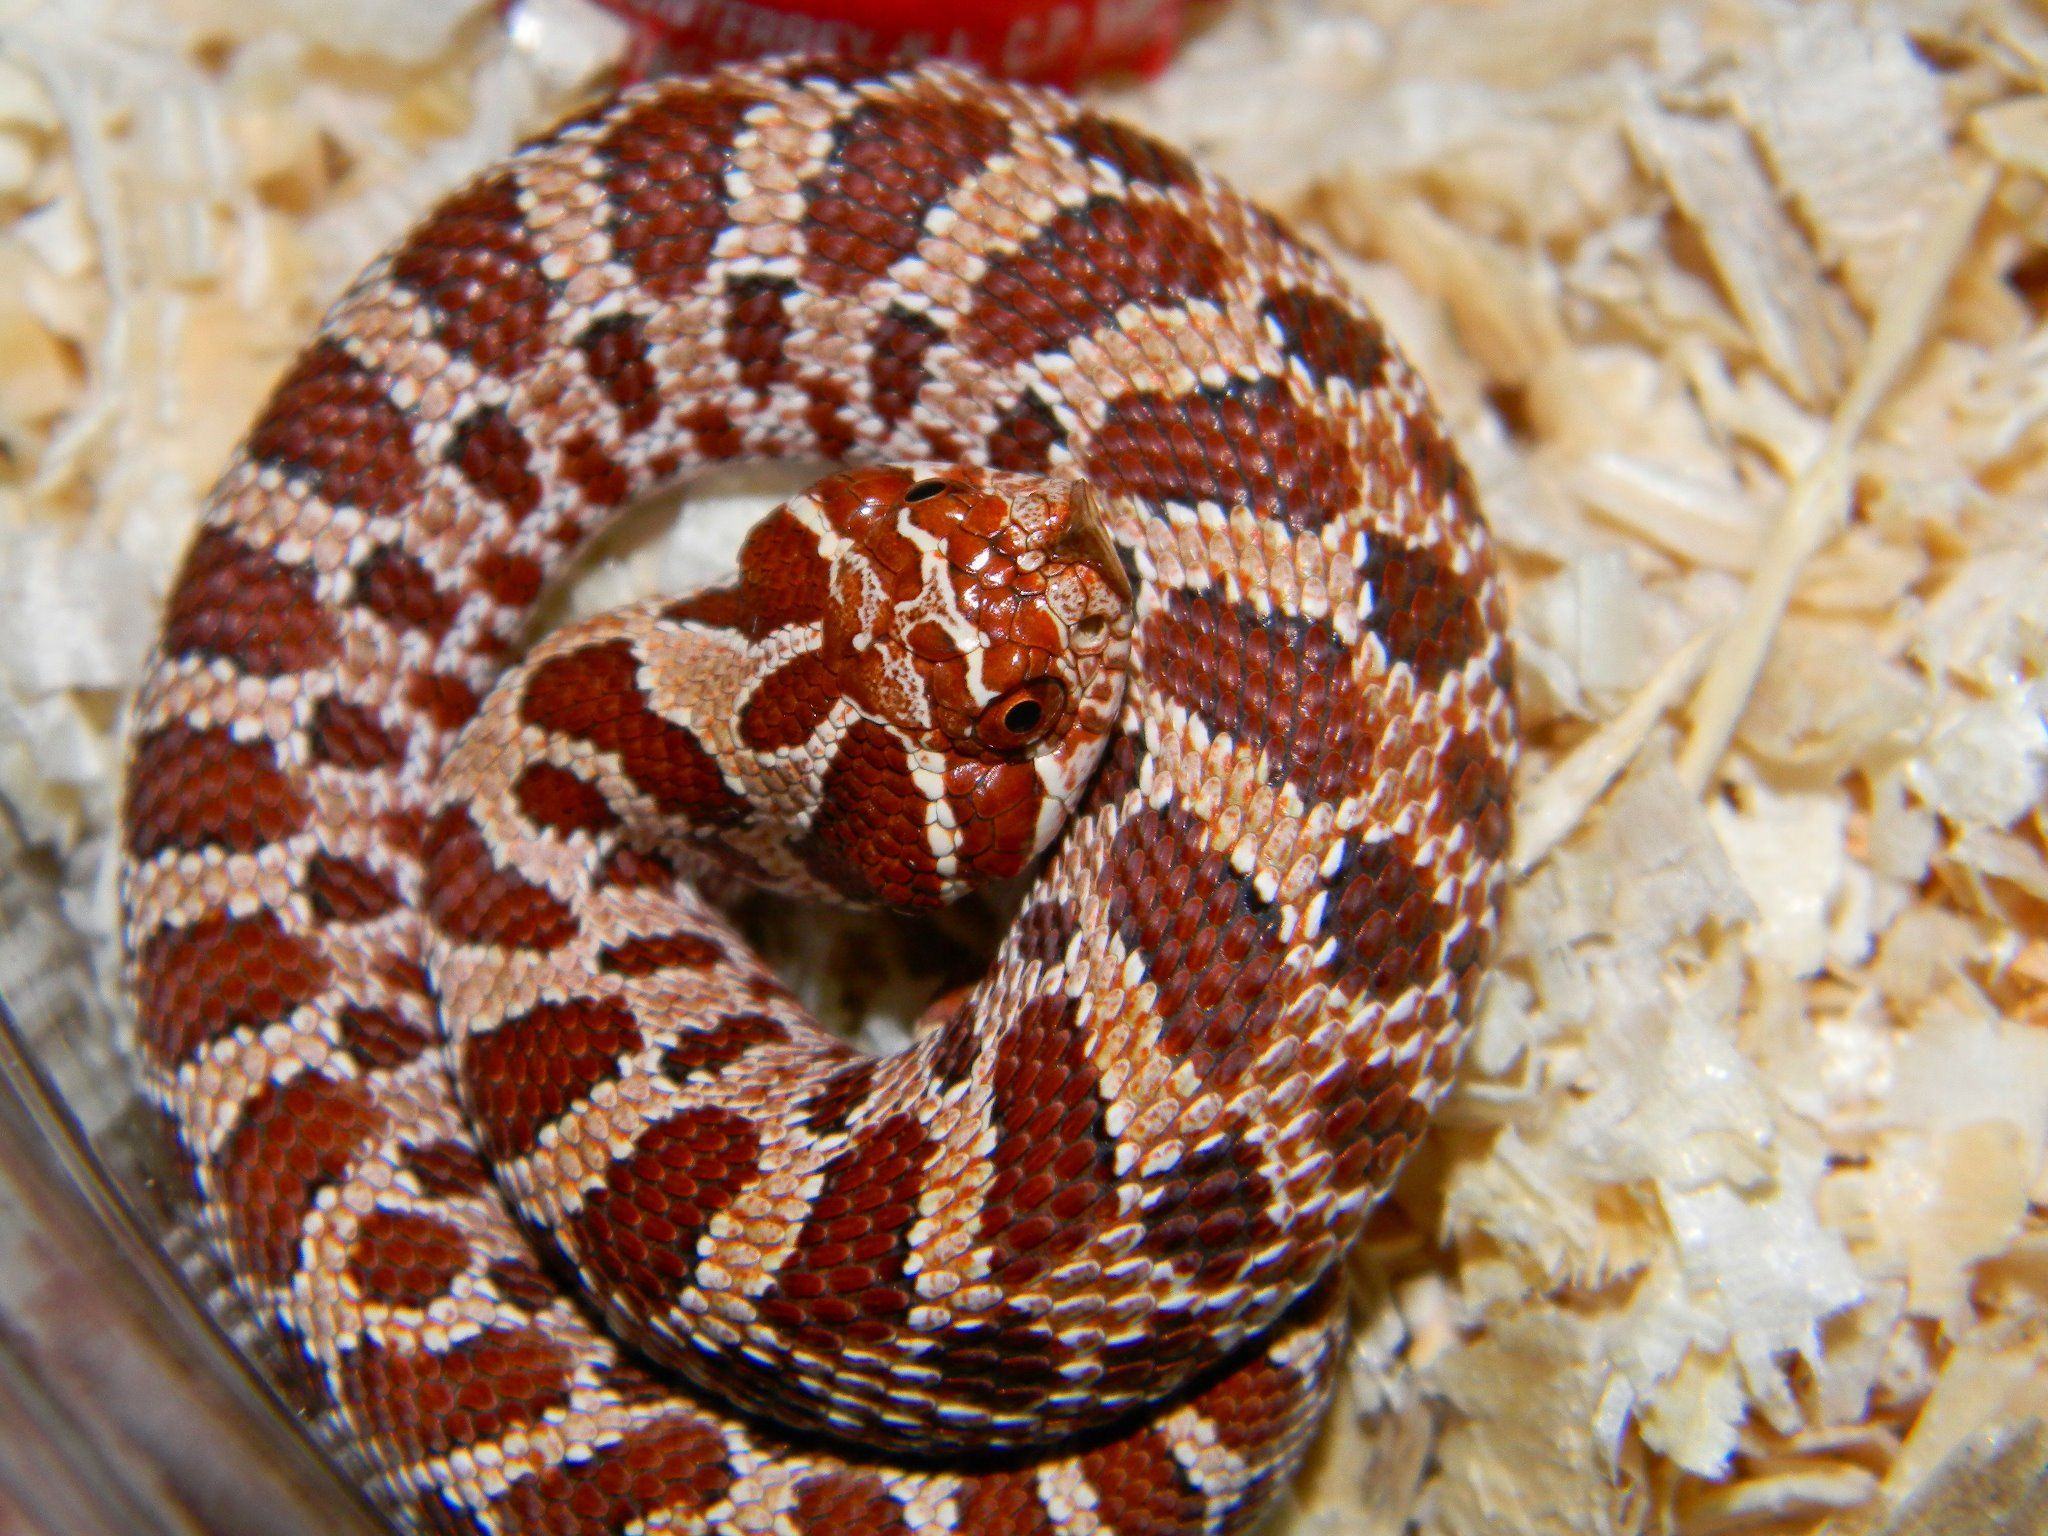 Purple Line Hognose Hognose Snake Cute Reptiles Western Hognose Snake